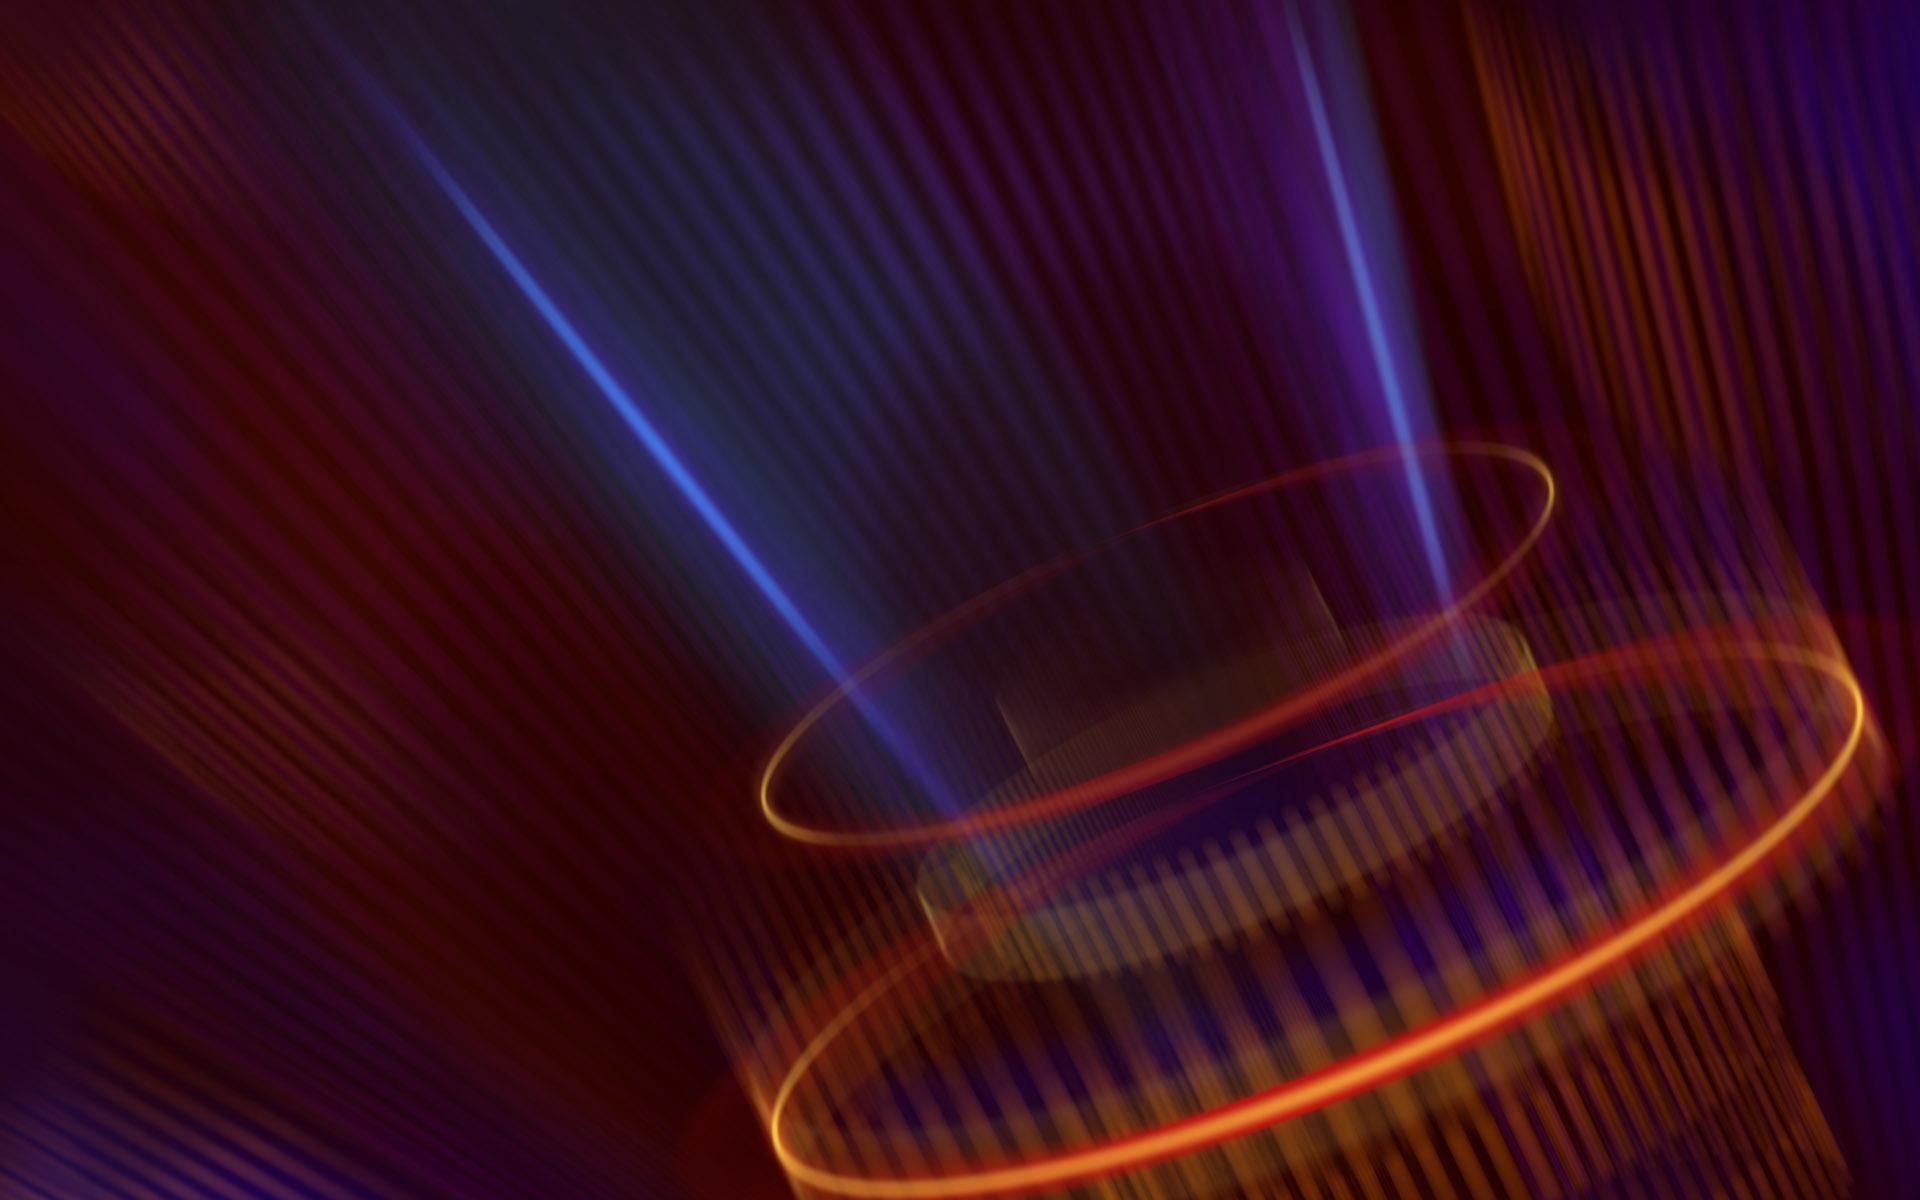 3d holographic wallpaper wallpapersafari - Imagenes con animacion ...